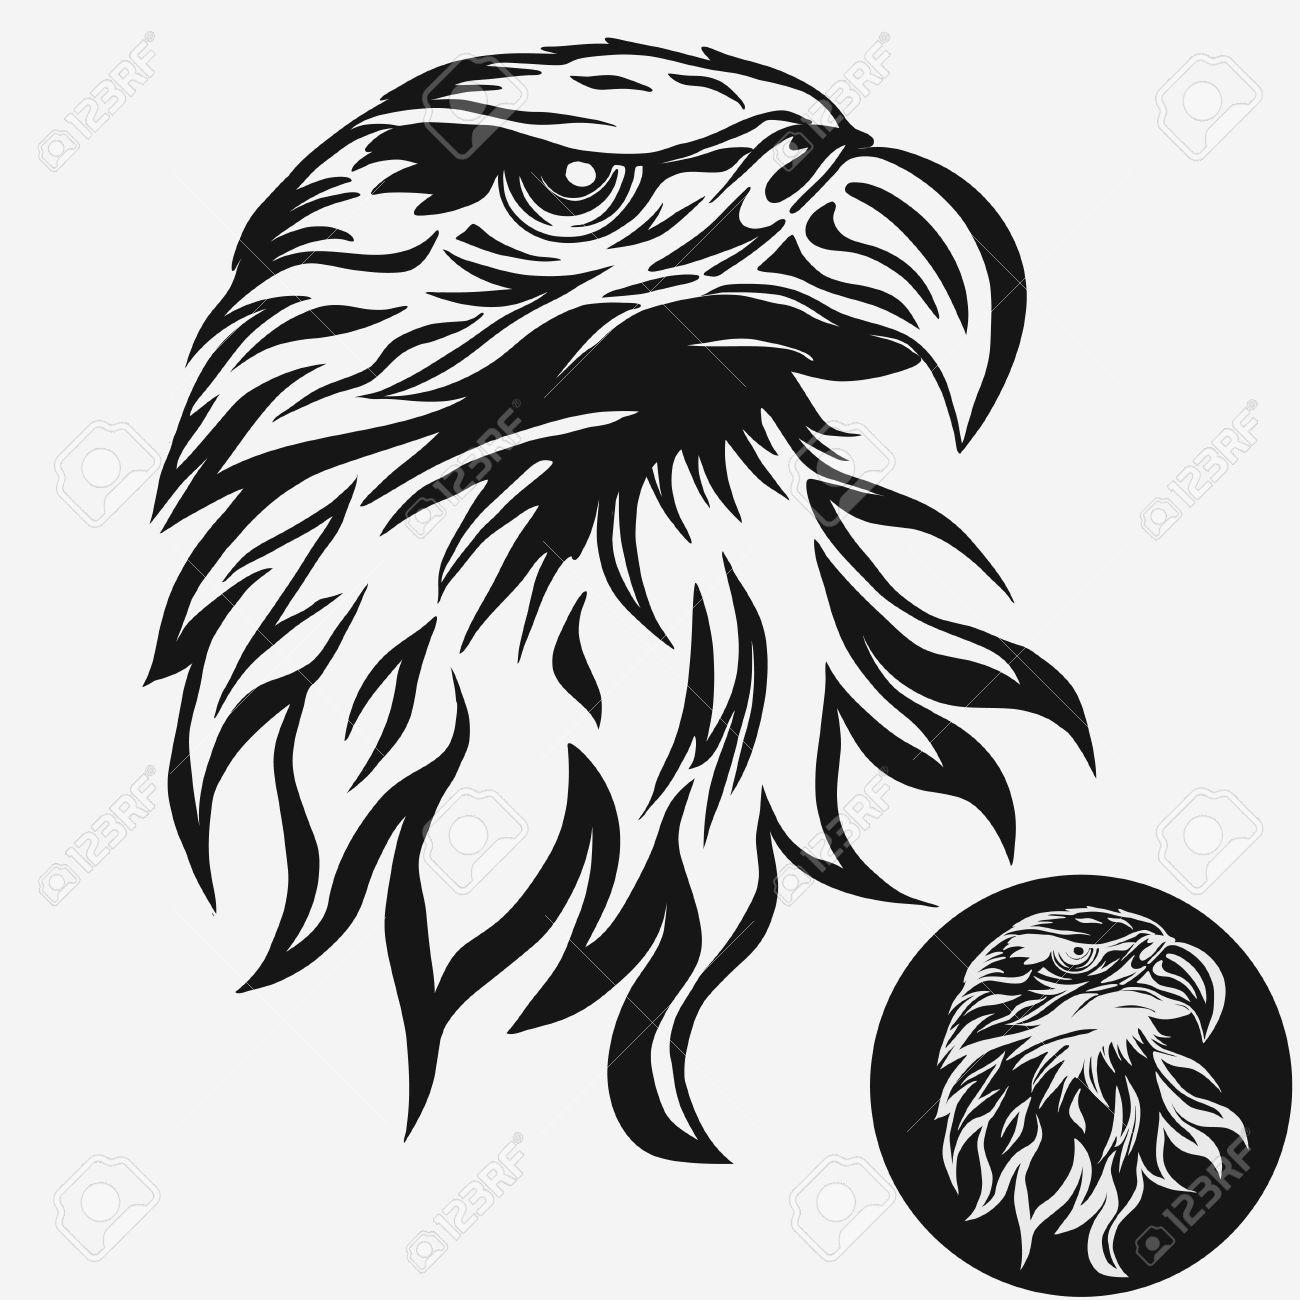 Eagle head logo Template, Hawk mascot graphic, Portrait of a bald eagle. Vector - 69140021